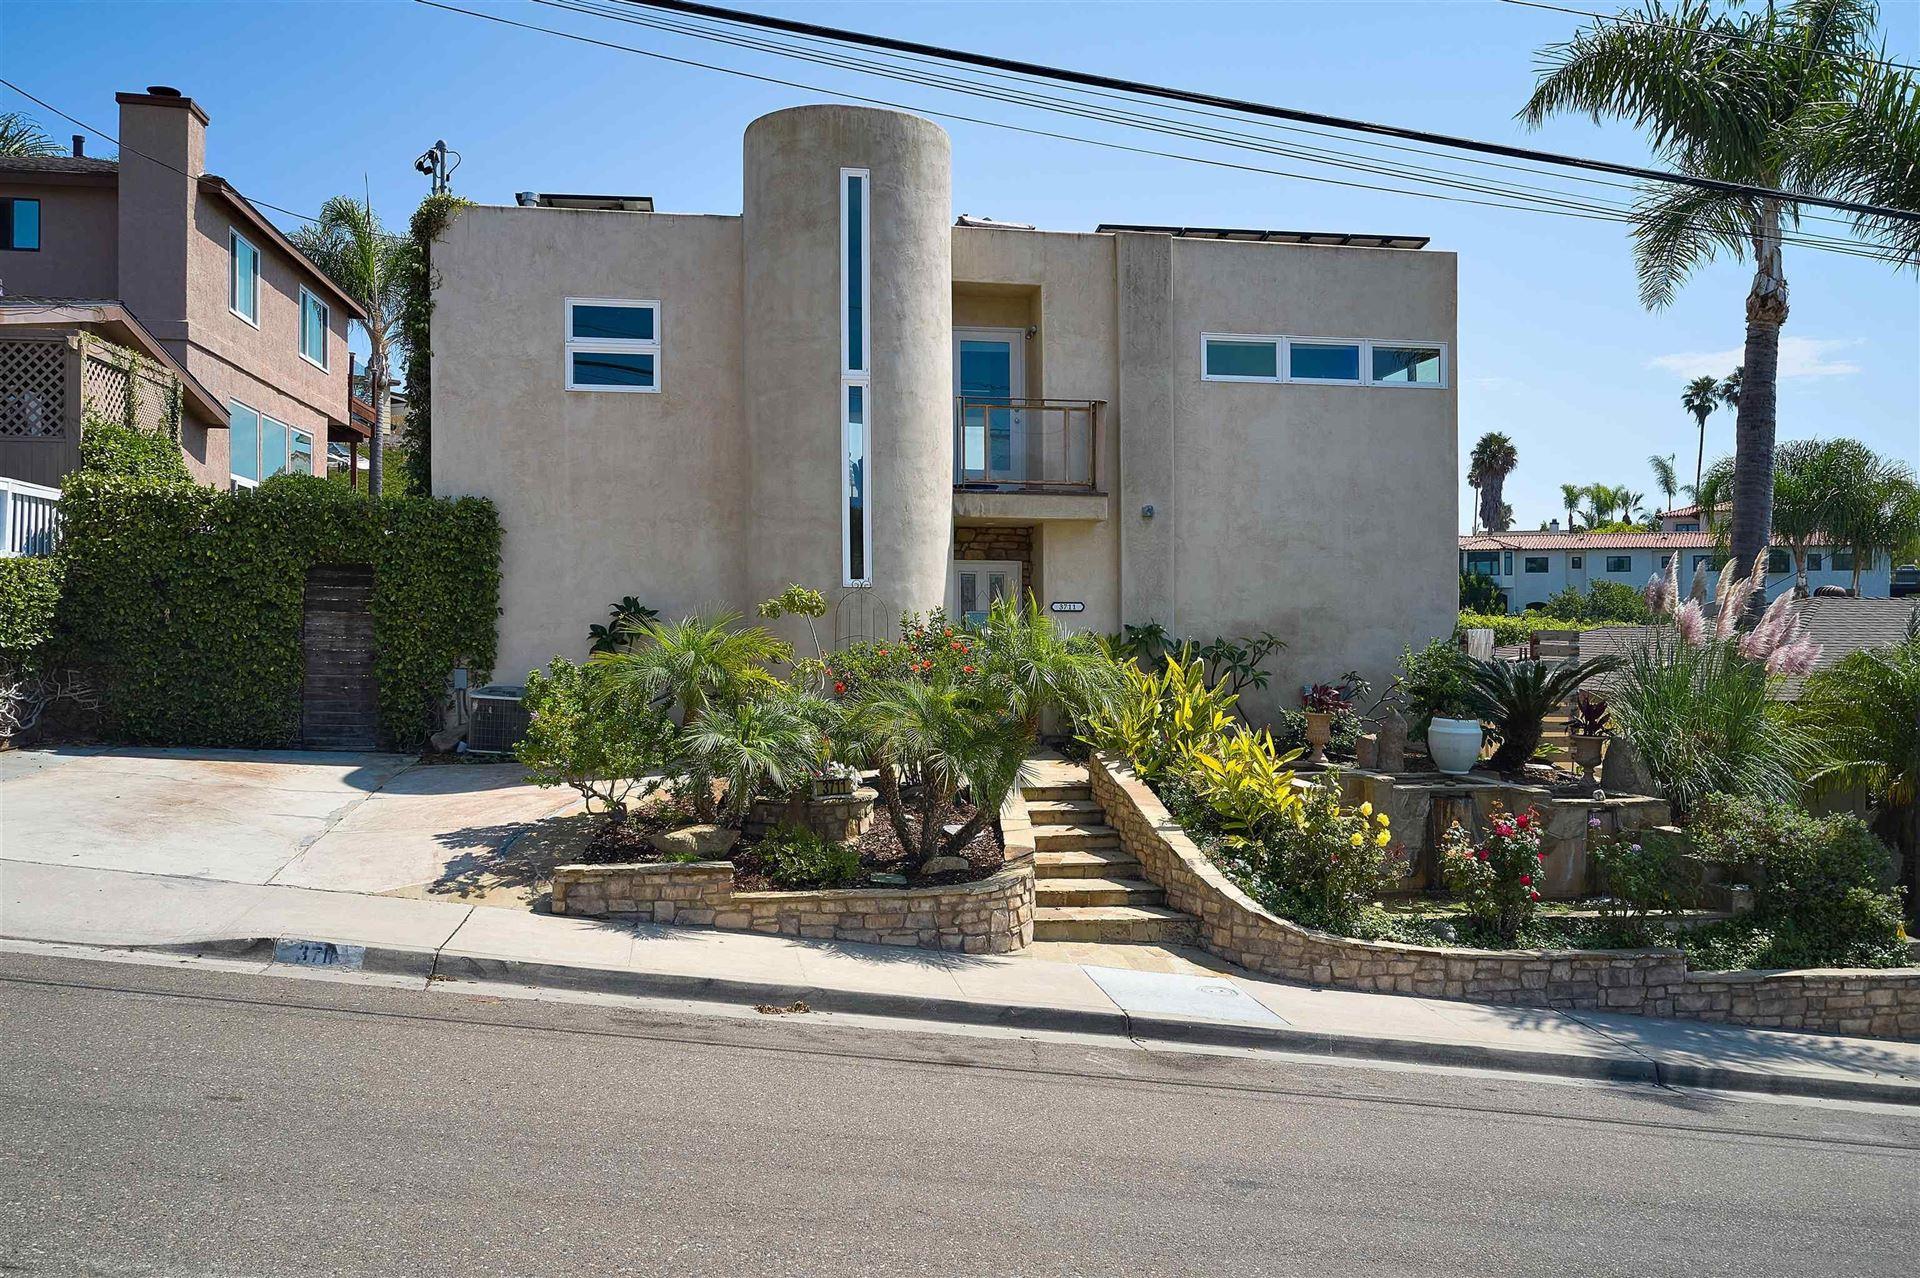 3711 Baker, San Diego, CA 92117 - #: 210026155